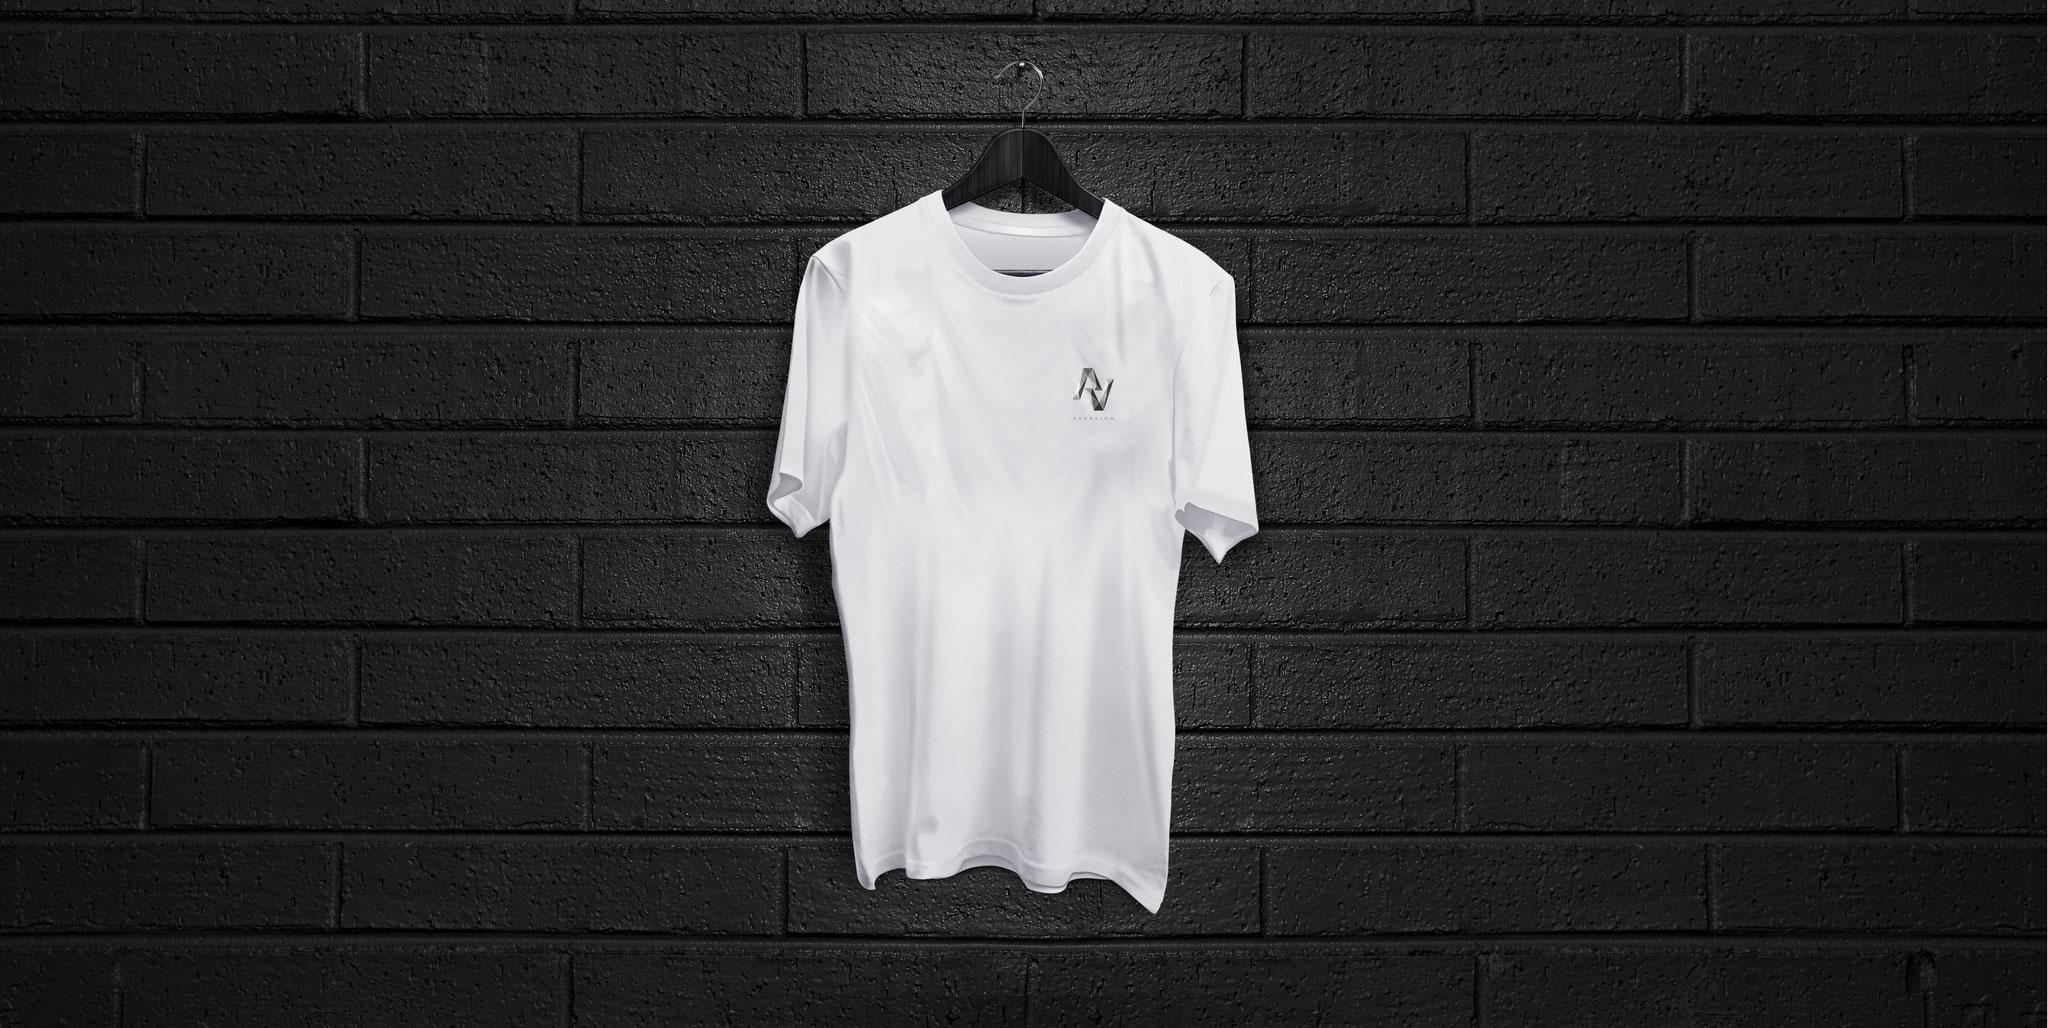 T-SHIRT WHITE | AVERSION-LOGO BRUST KLEIN